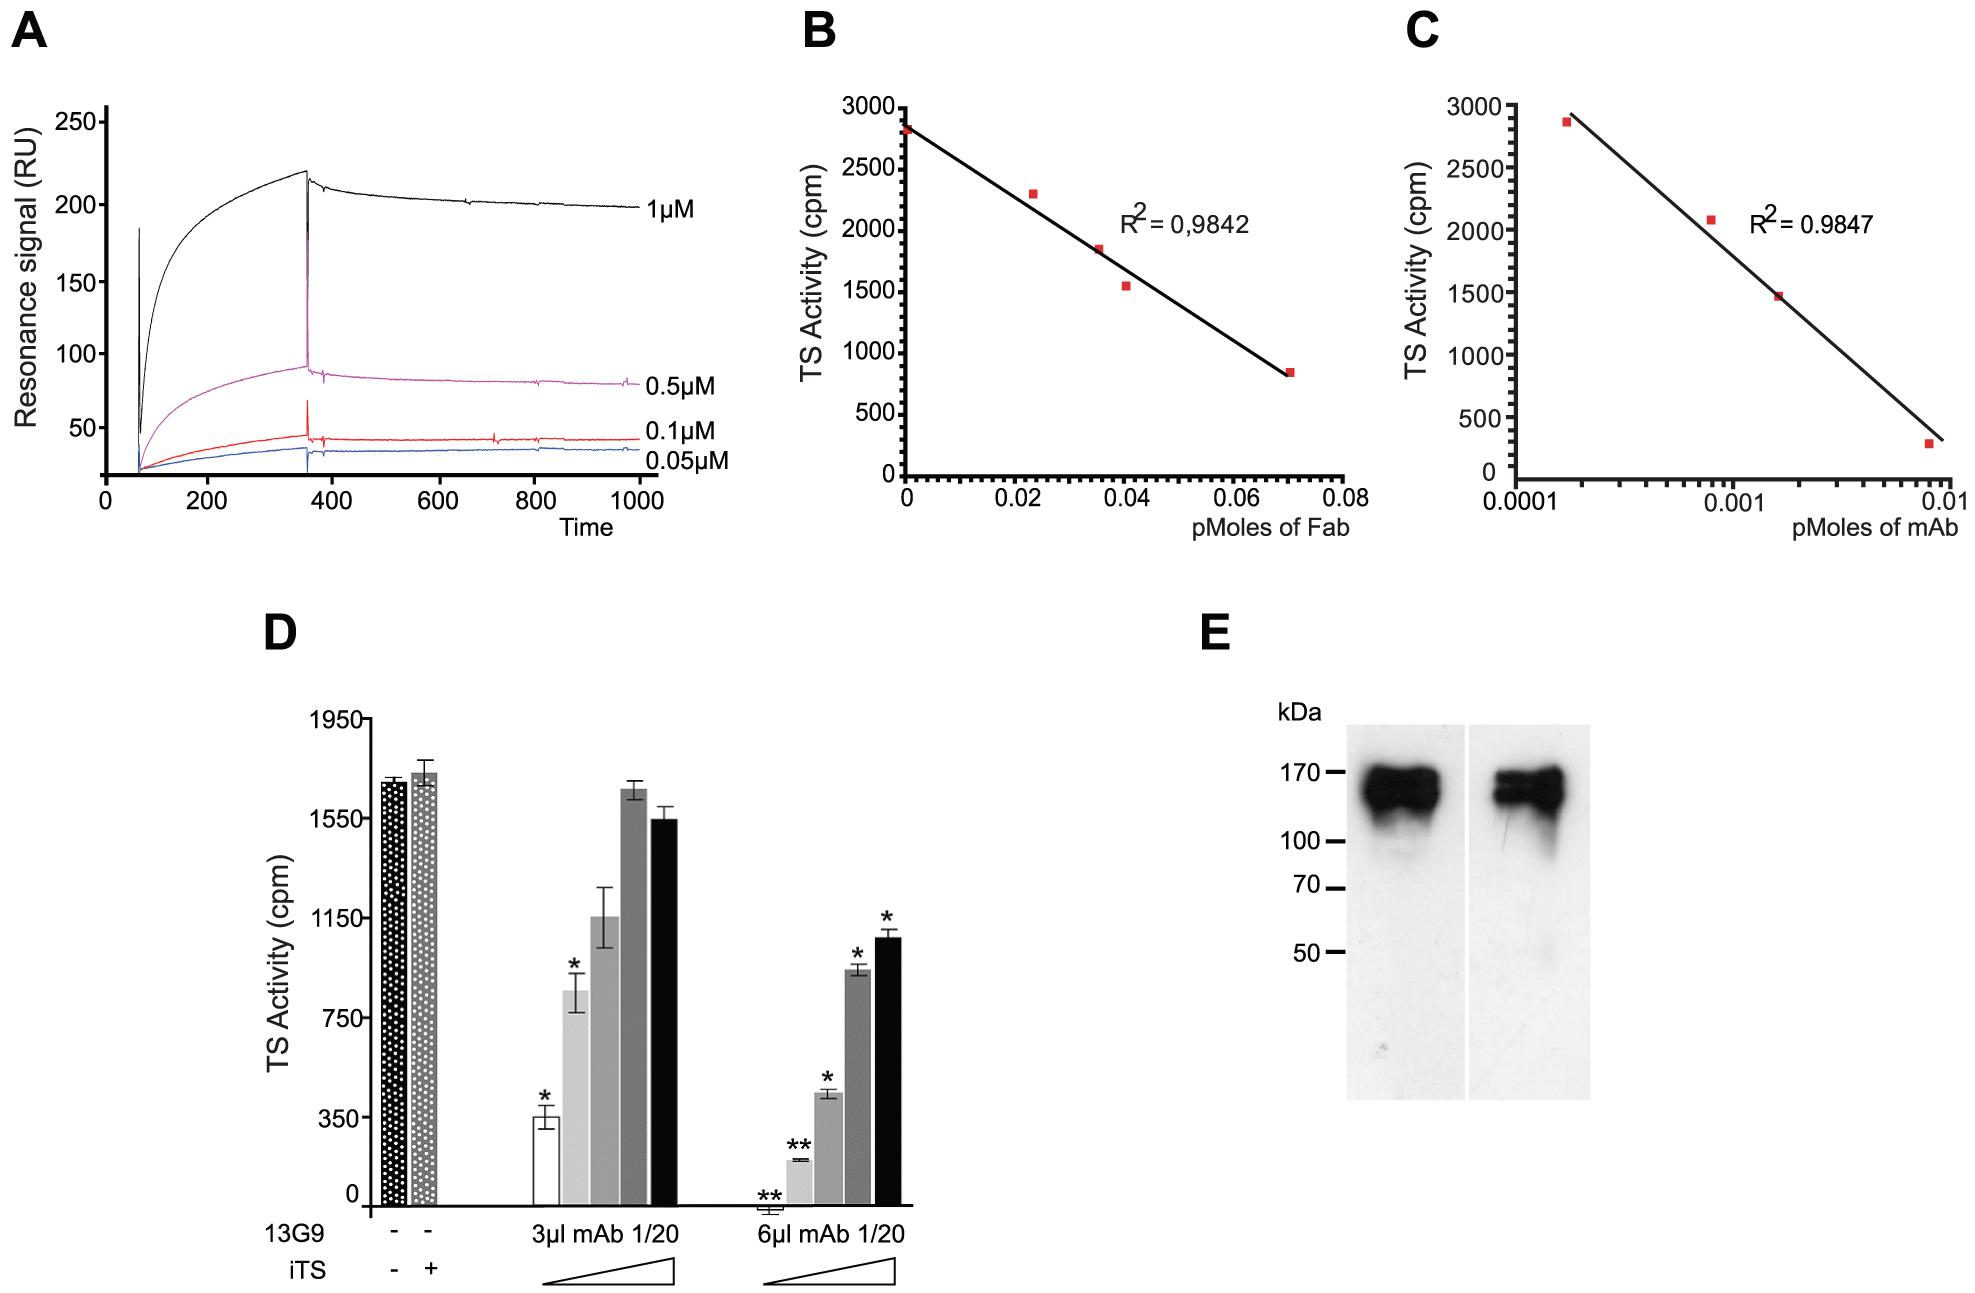 Biochemical characterization of the TS-13G9 mAb interaction.